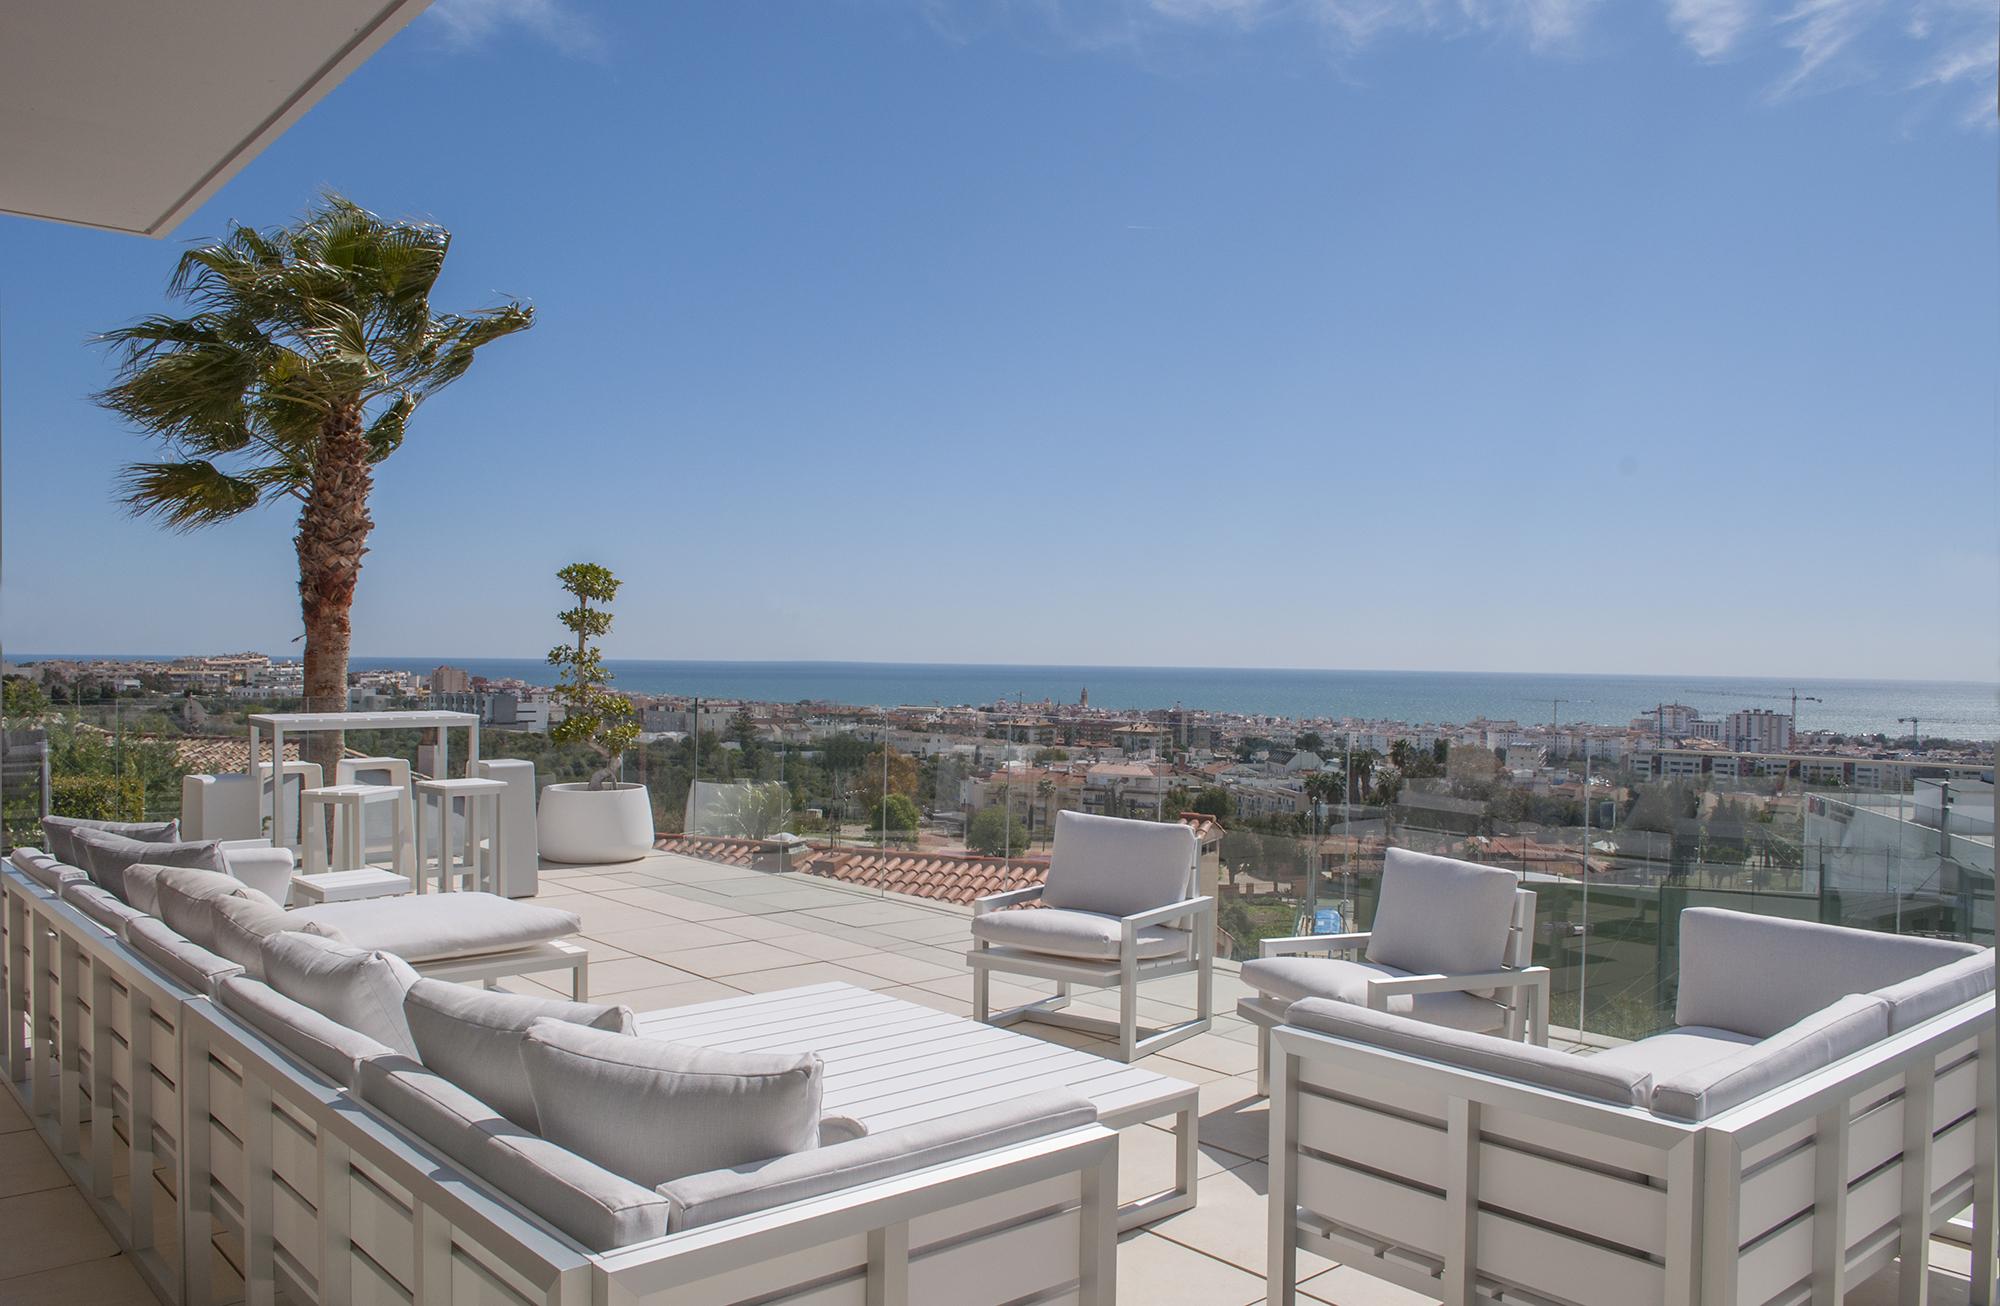 11-rardo-architects-casas-en-sitges-vista-al-mar-terraza